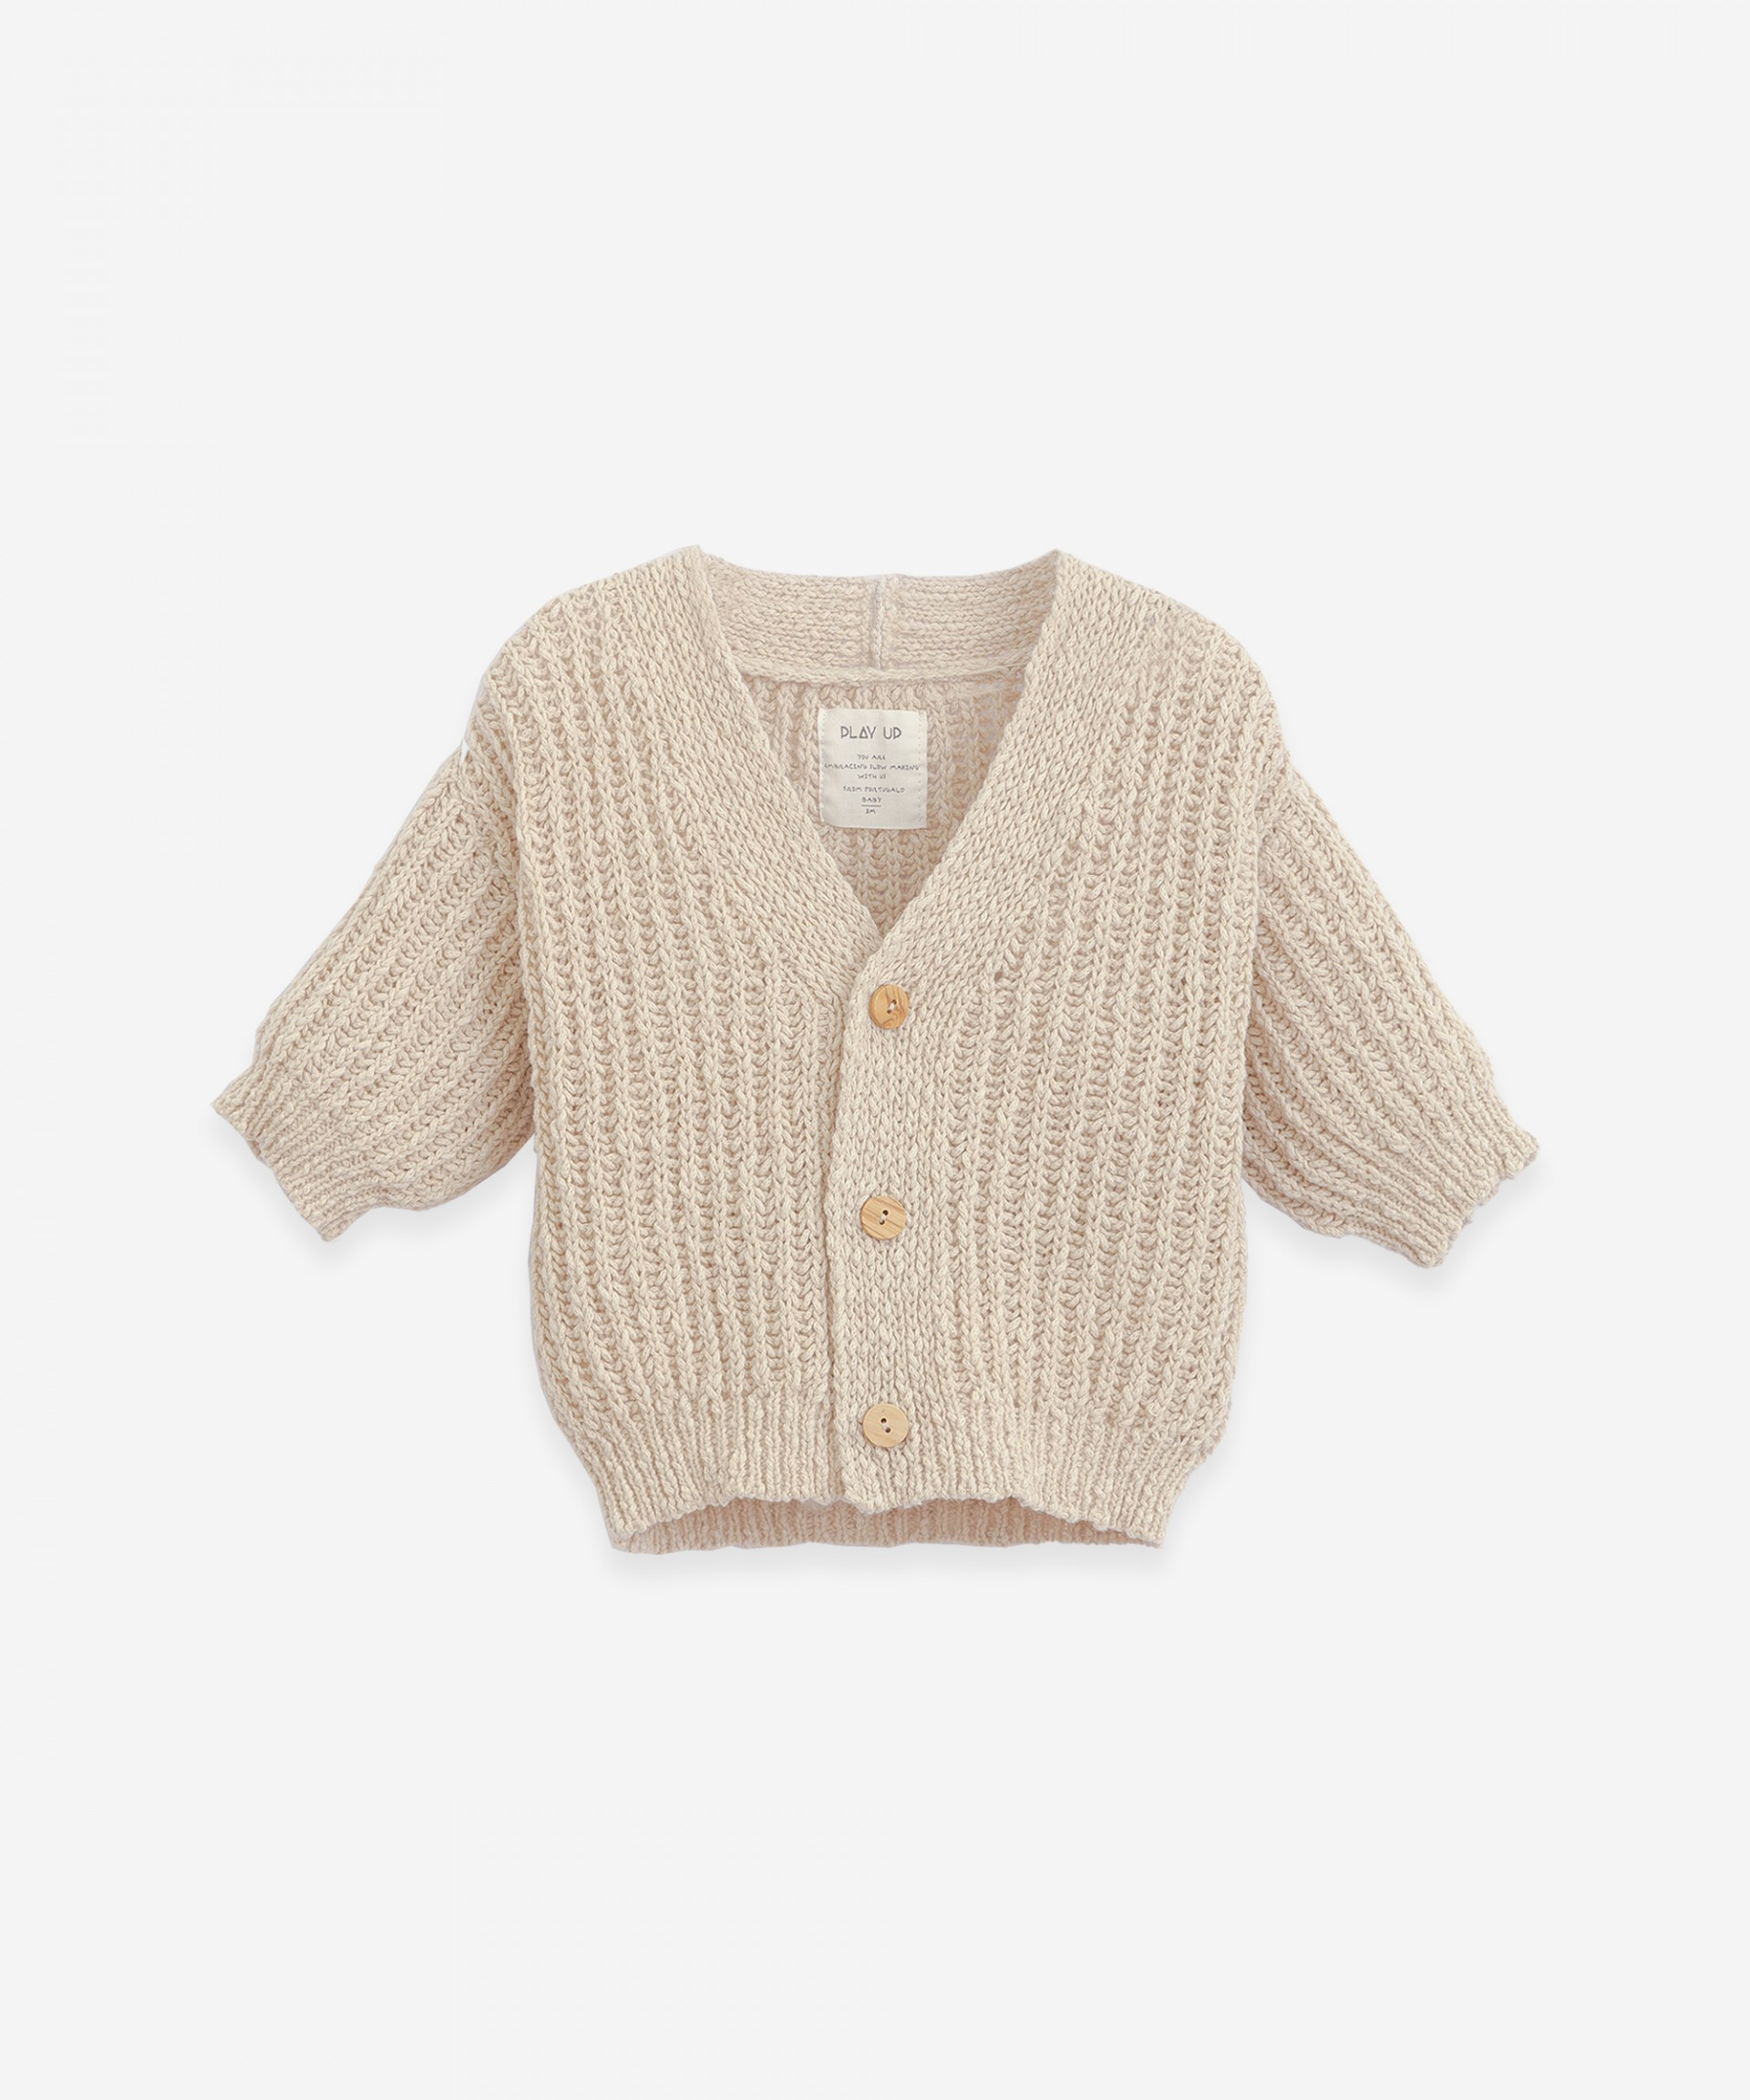 Jersey stitch V-neck cardigan | Botany